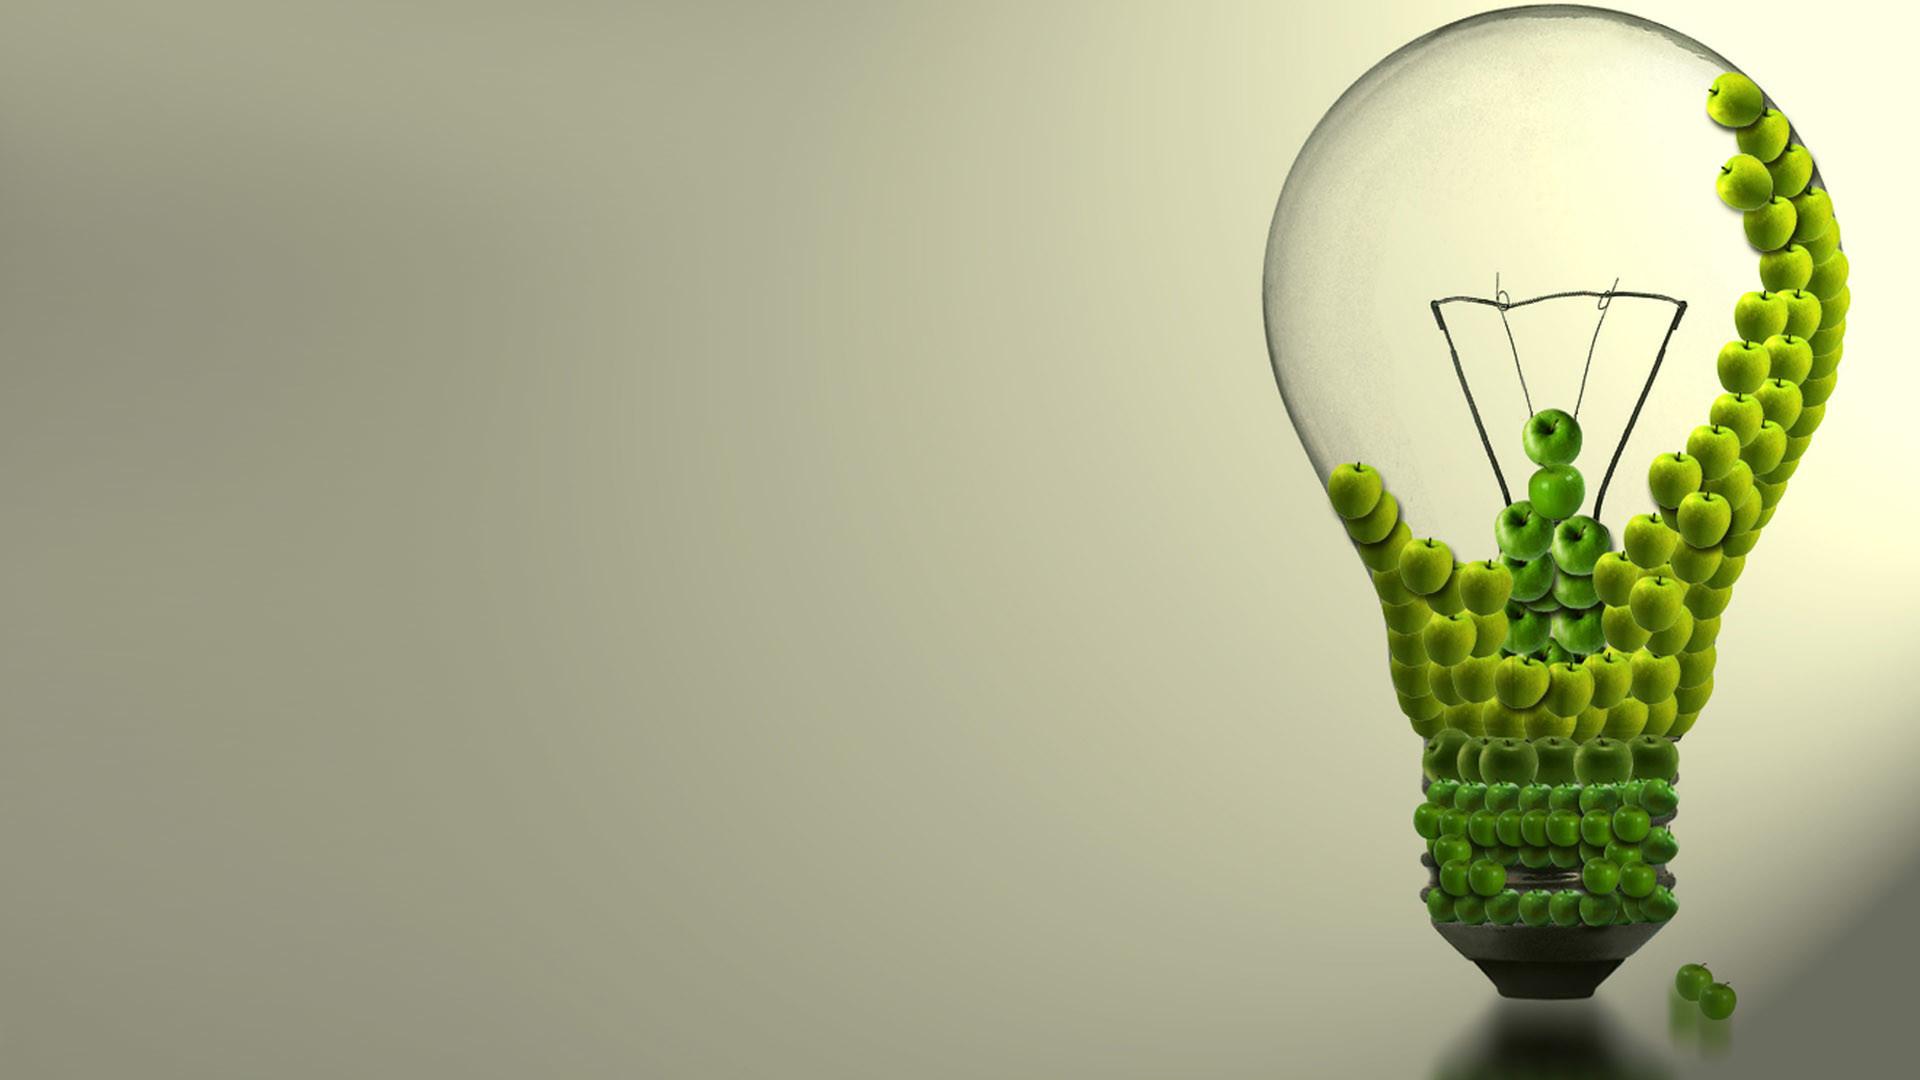 Light Bulb Apples Abstract Wallpaper